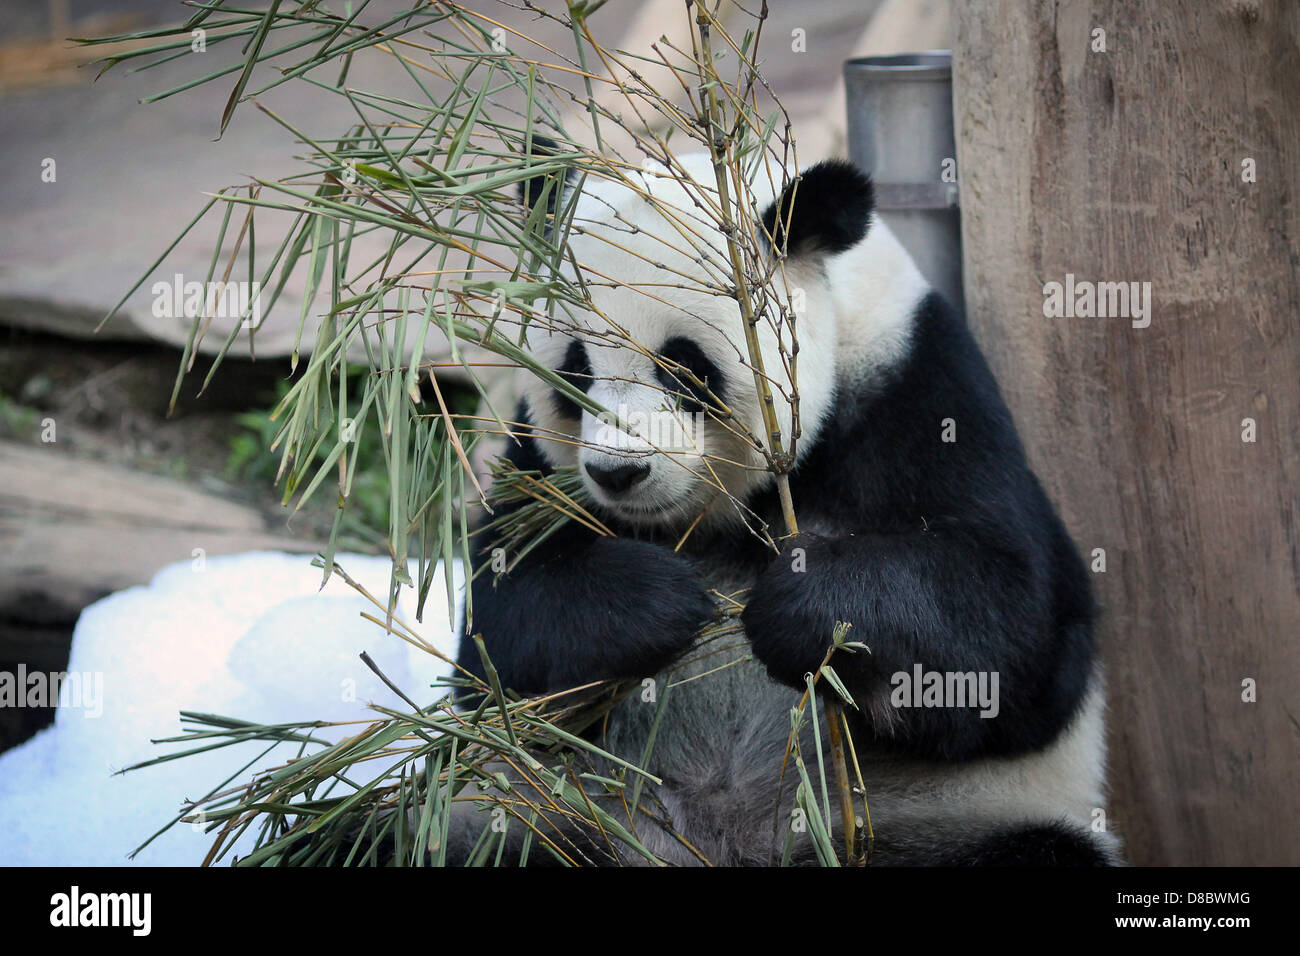 A giant panda, pictured in the zoo of Chiang Mai, Thailand. Photo: Fredrik von Erichsen Stock Photo